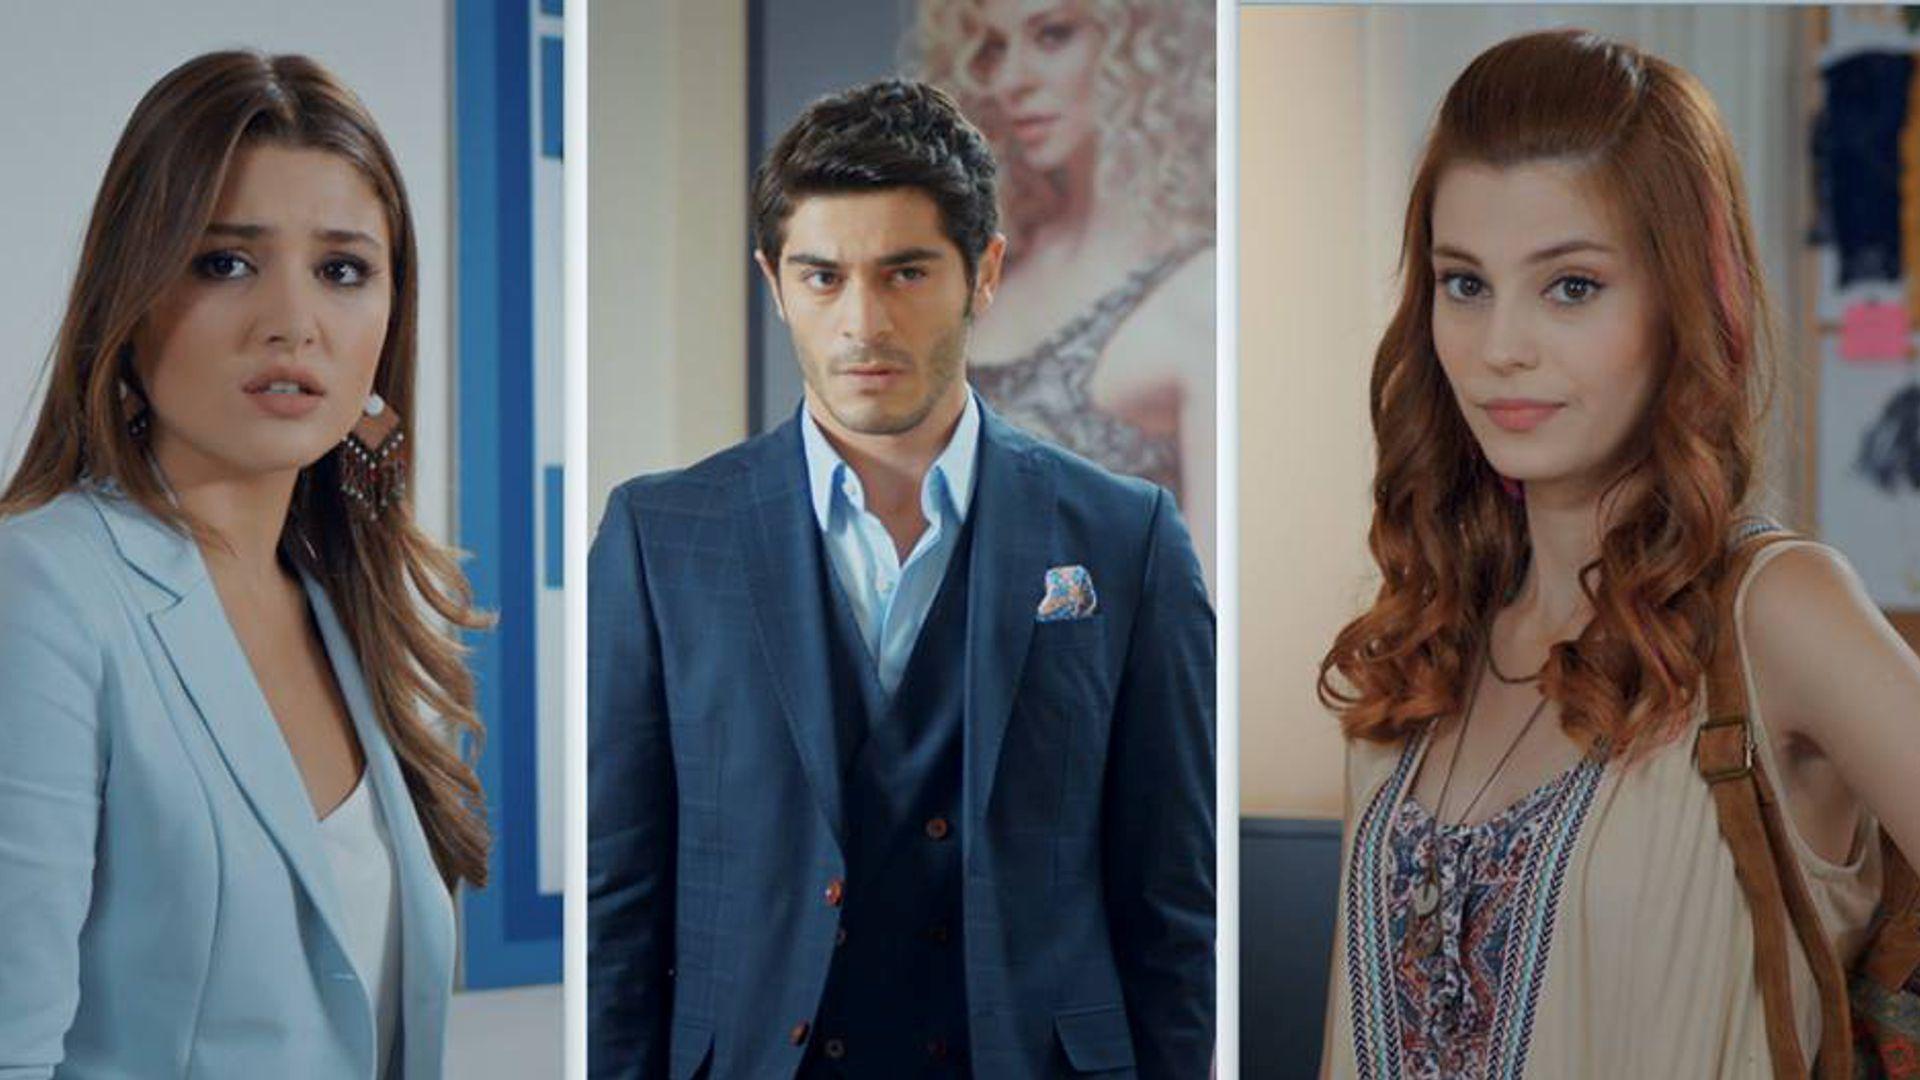 Aşk Laftan Anlamaz - Where to Watch Every Episode Streaming